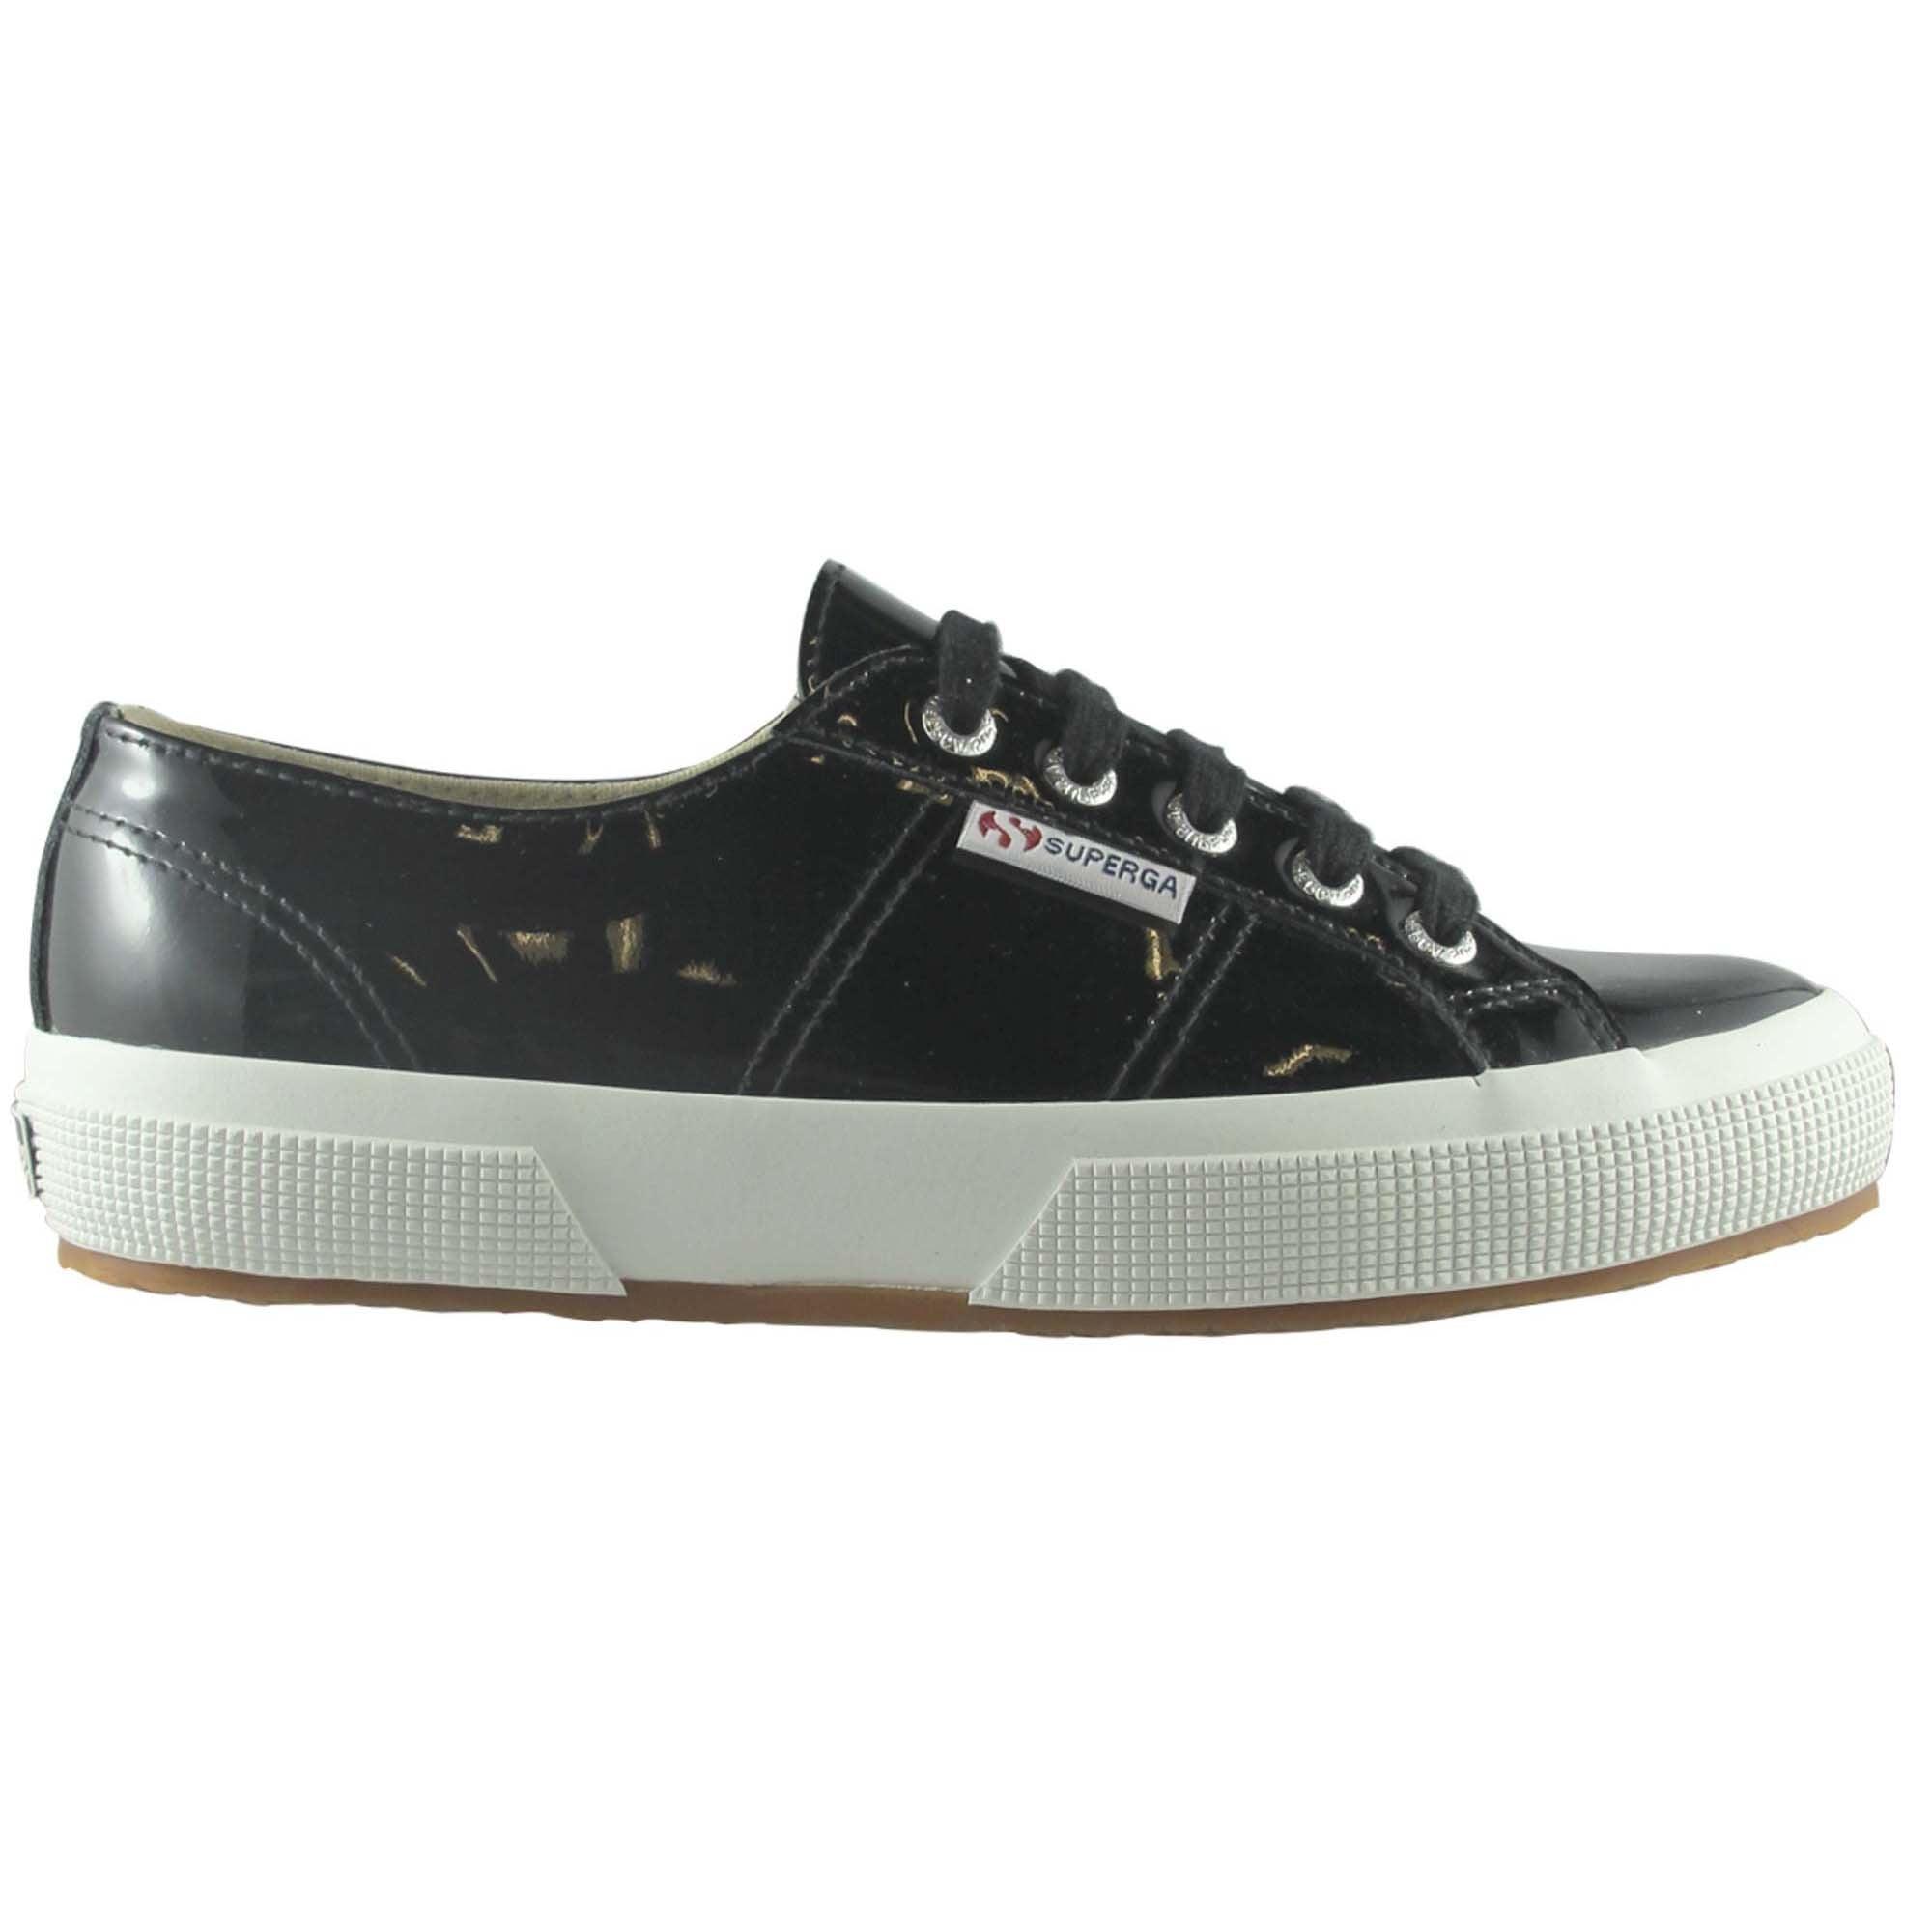 2750 Leather In Black Patent Sneaker XZN8Pkn0wO